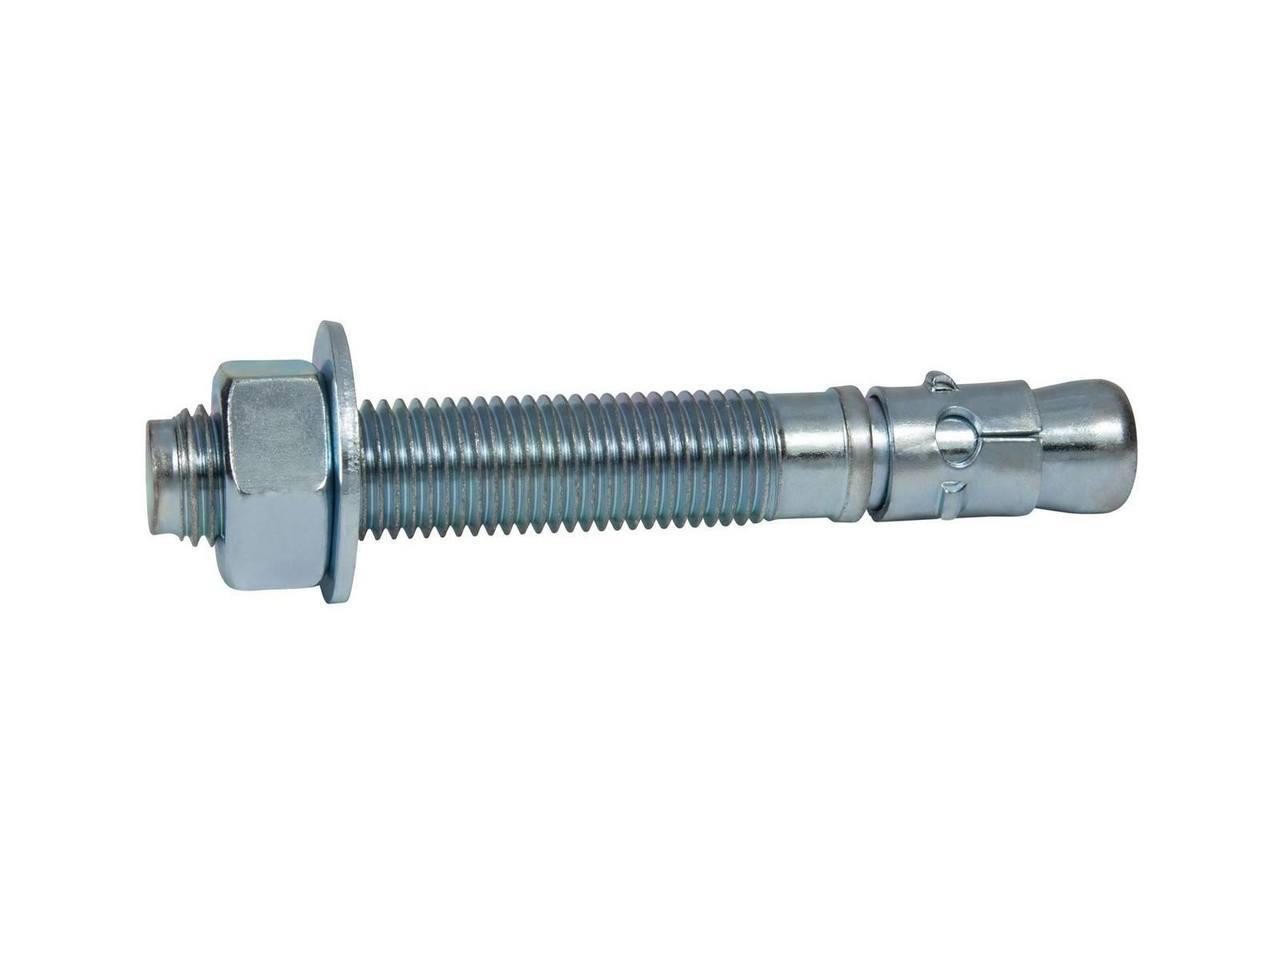 Hex Head 1//4 x 3-1//2 Lag Bolts Galvanized Wood Screws 125